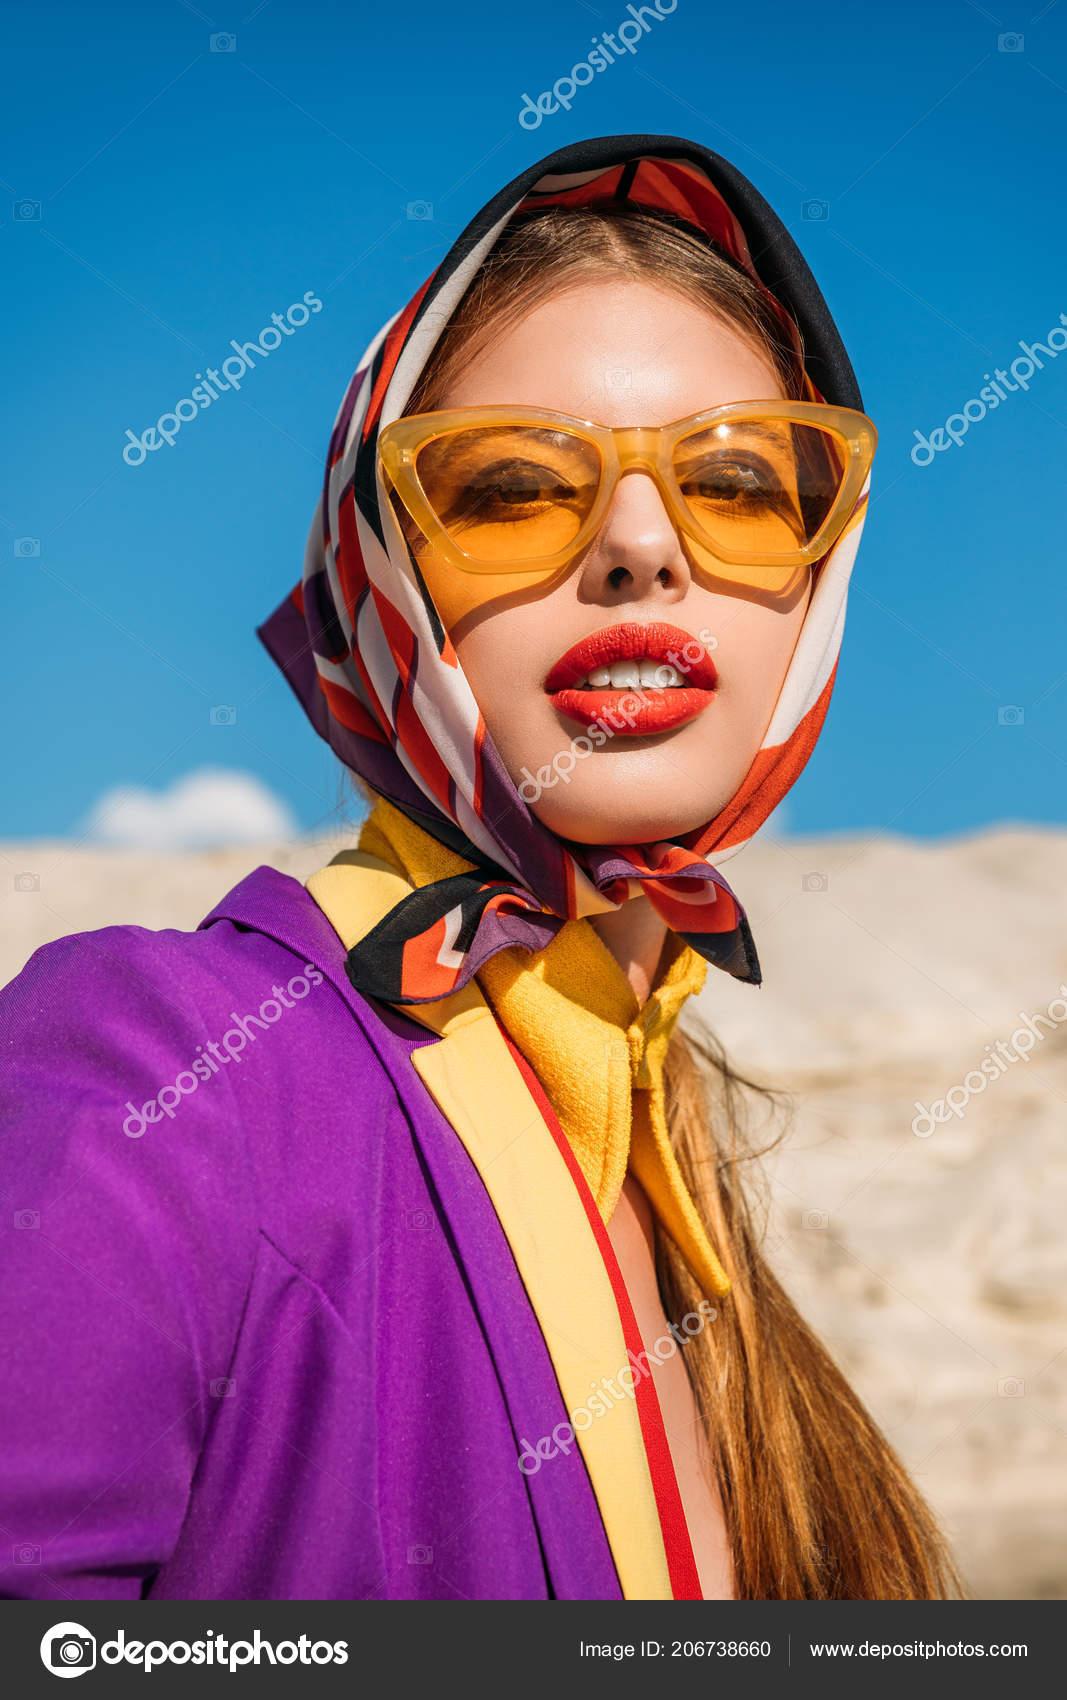 ba75b4929c Πορτρέτο Του Κομψό Νεαρή Γυναίκα Μοντέρνα Γυαλιά Ηλίου Κίτρινα — Φωτογραφία  Αρχείου